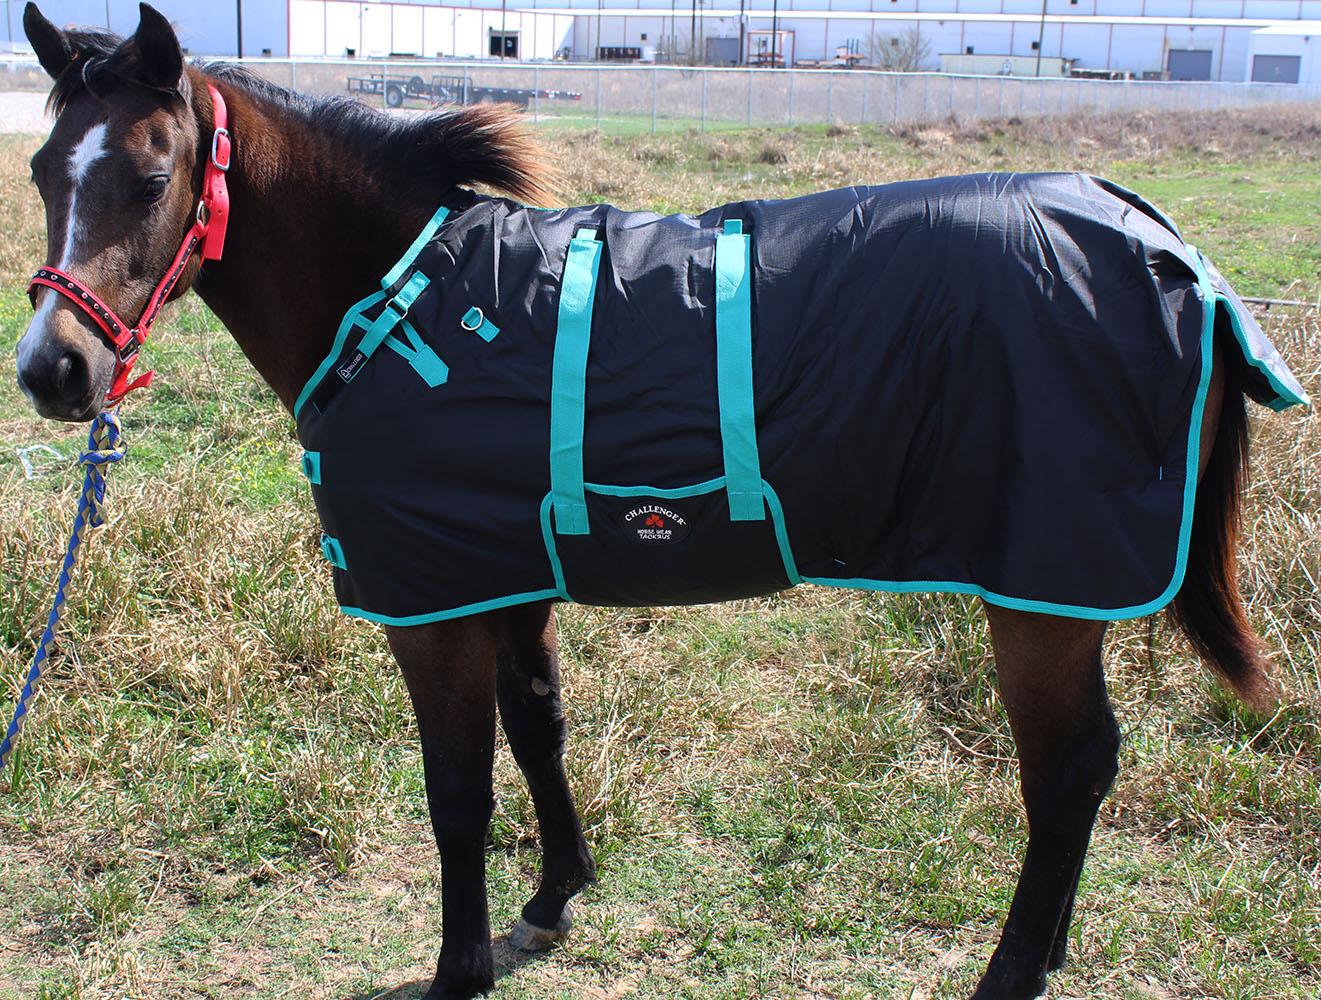 600D Miniature Weanling Donkey Pony Pony Donkey Horse Foal Winter Blanket 519600D 0f56f6